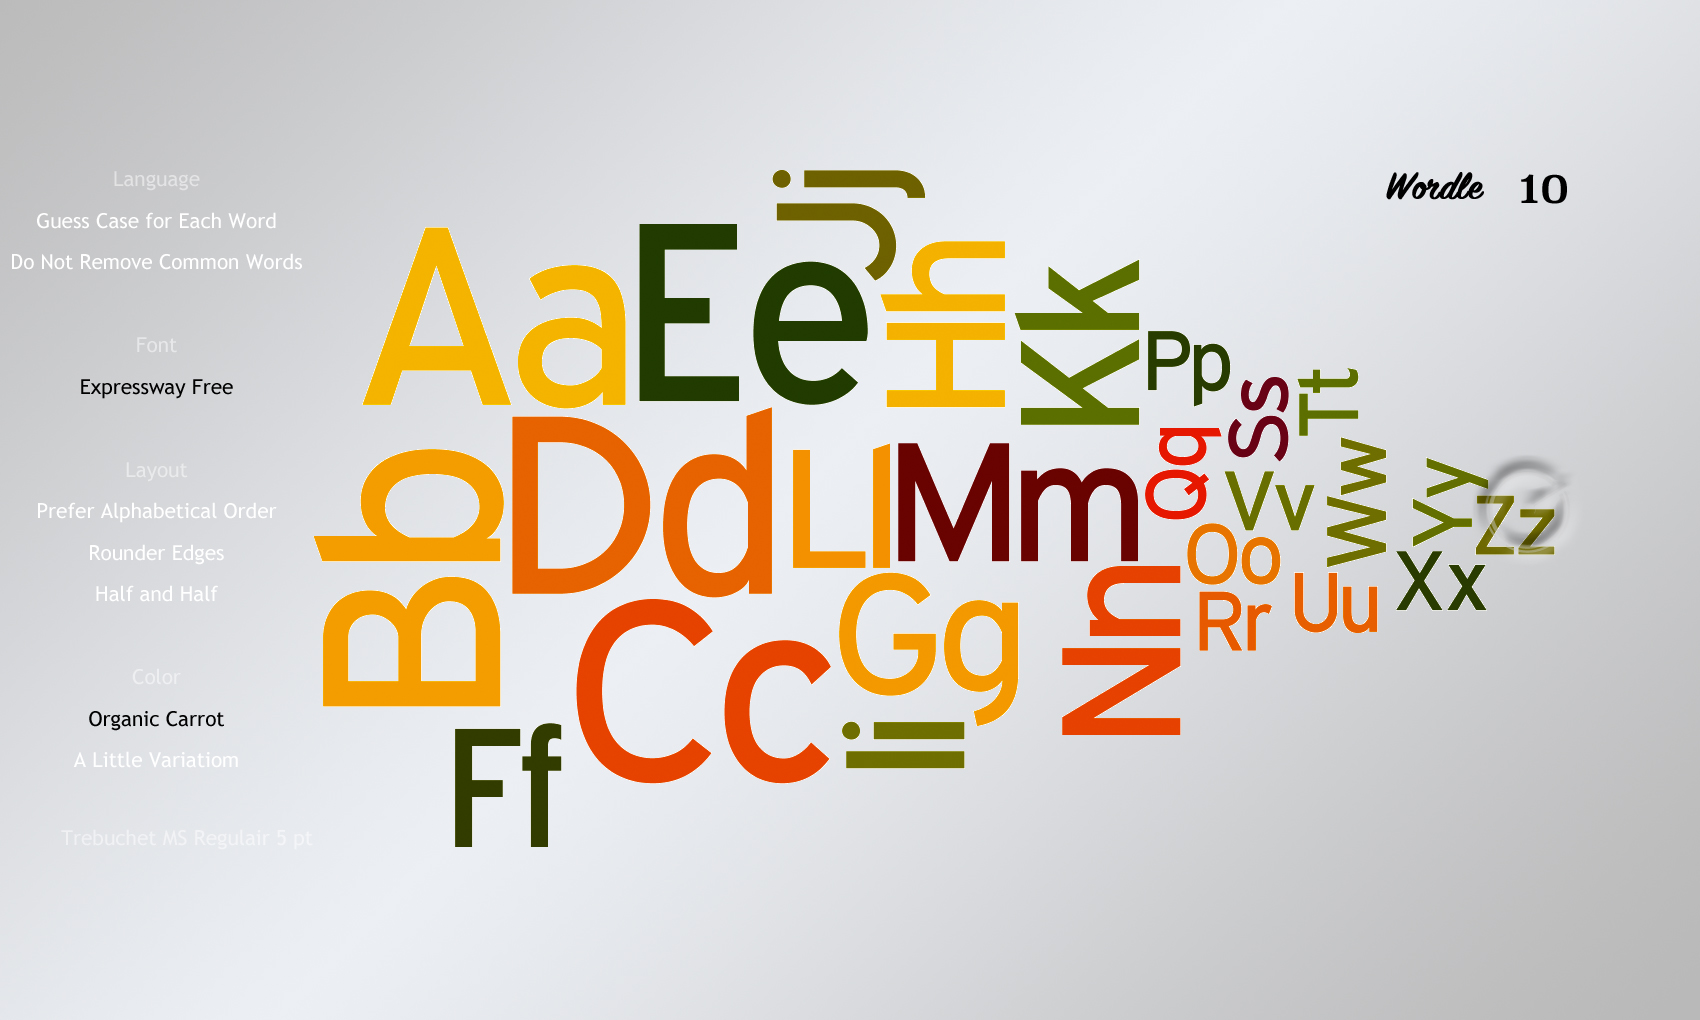 Wordle 10 Expressway Free